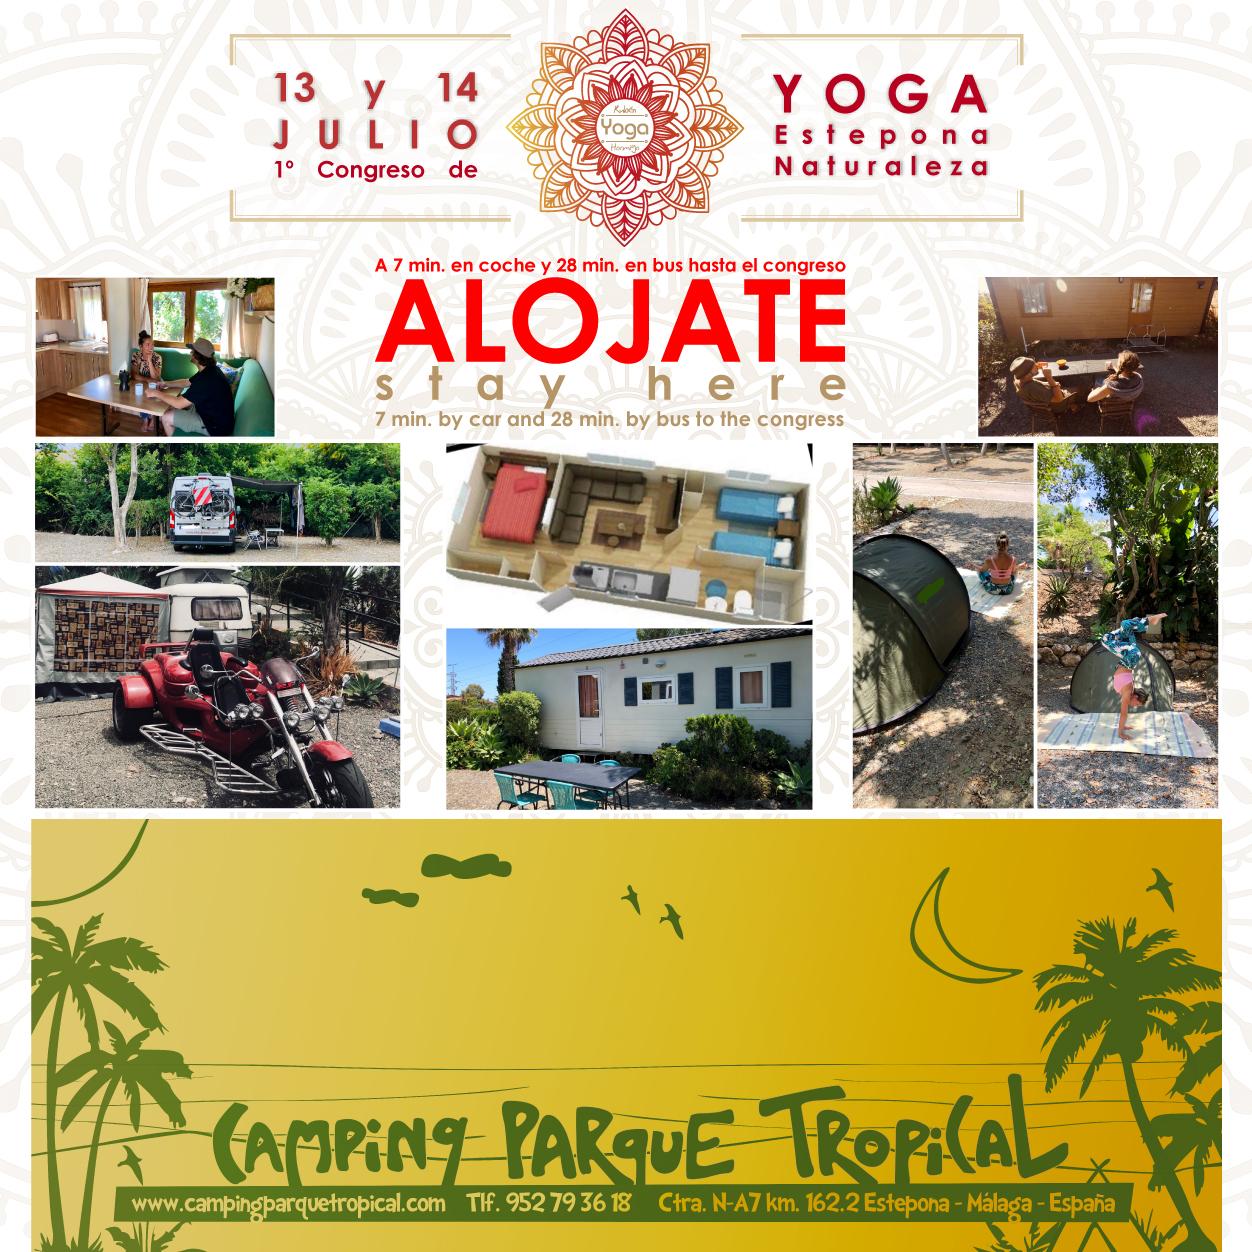 Camping tropical yogaesteponanaturaleza